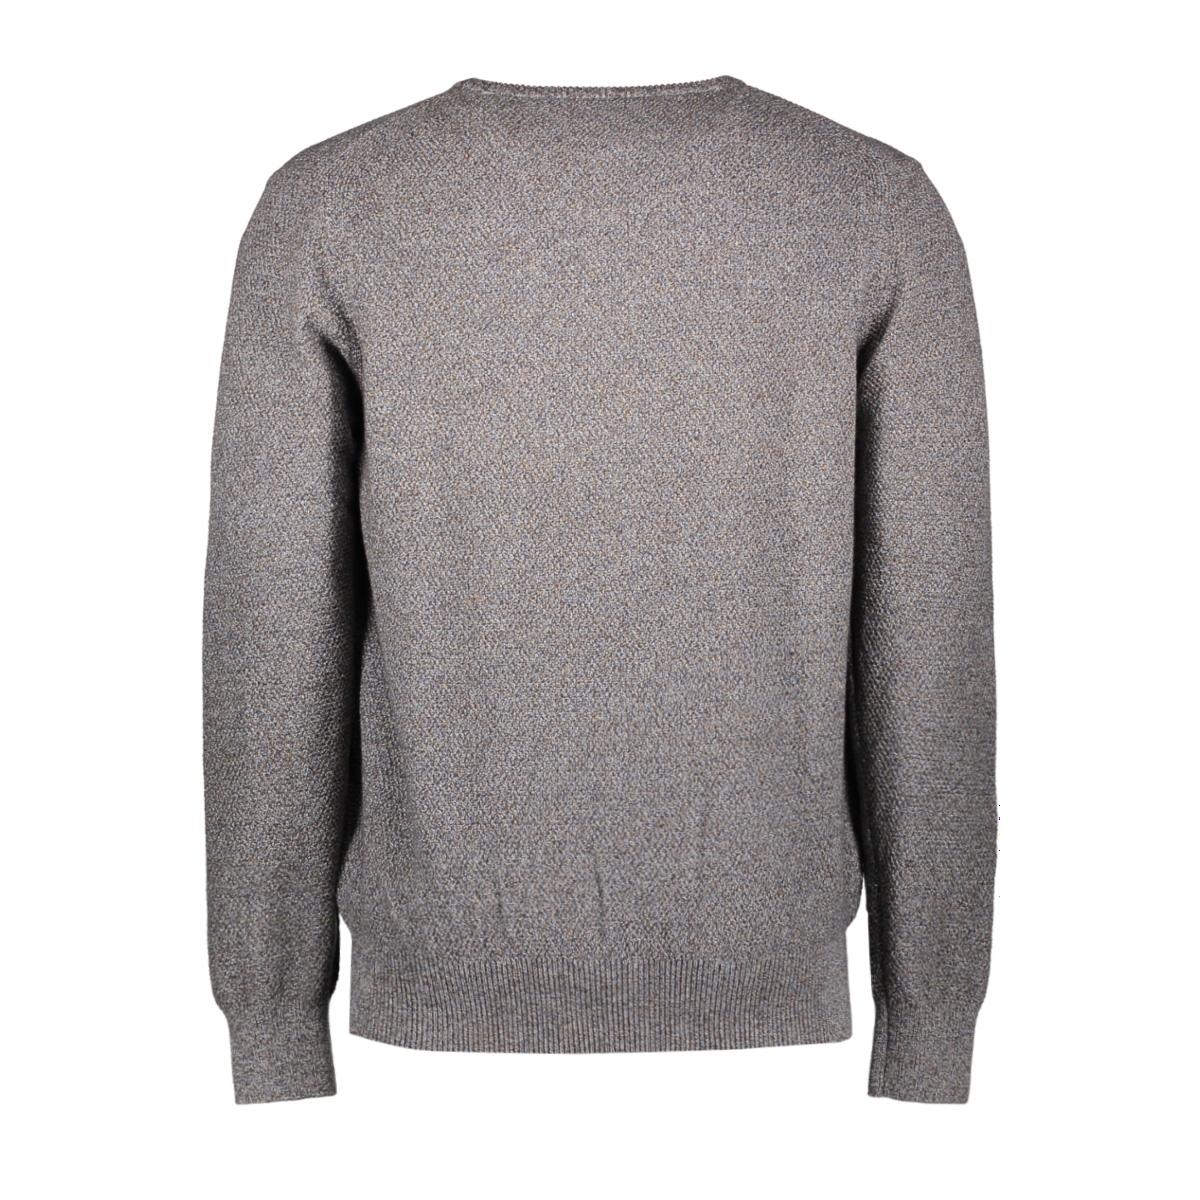 111-37015 bluefields sweater 5984